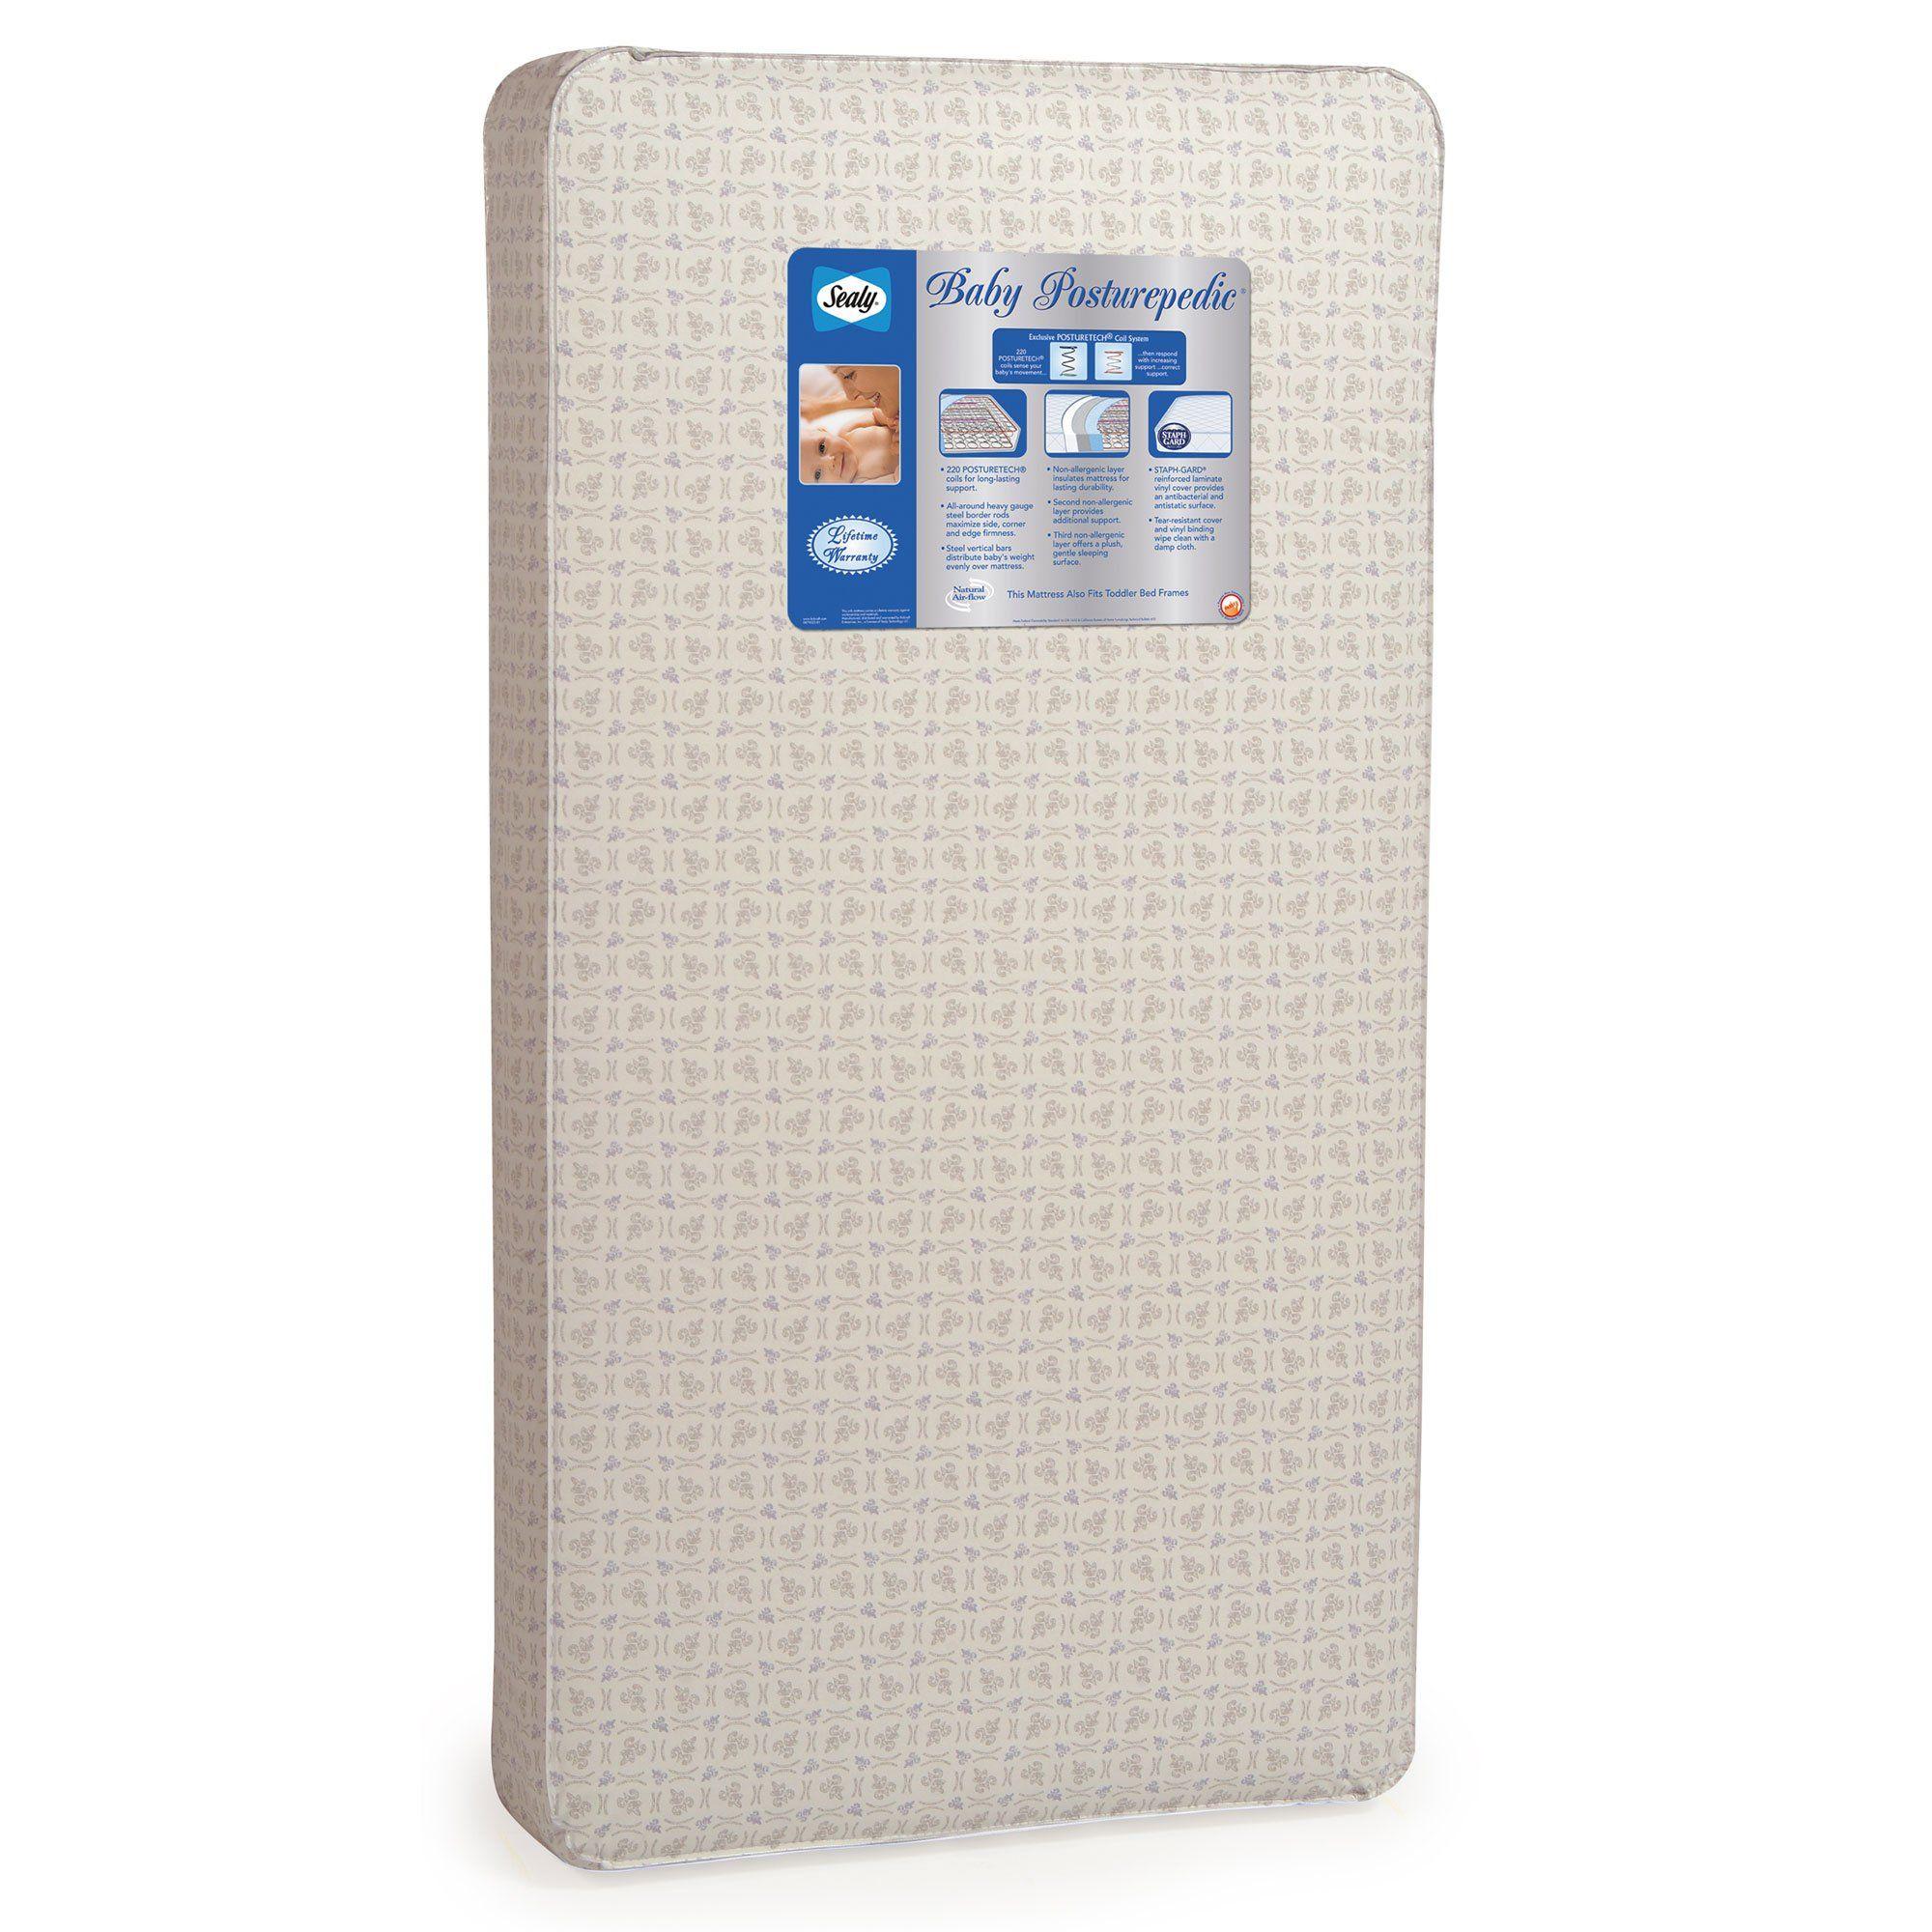 Crib Mattress Sealy Baby Posturepedic Crib mattress